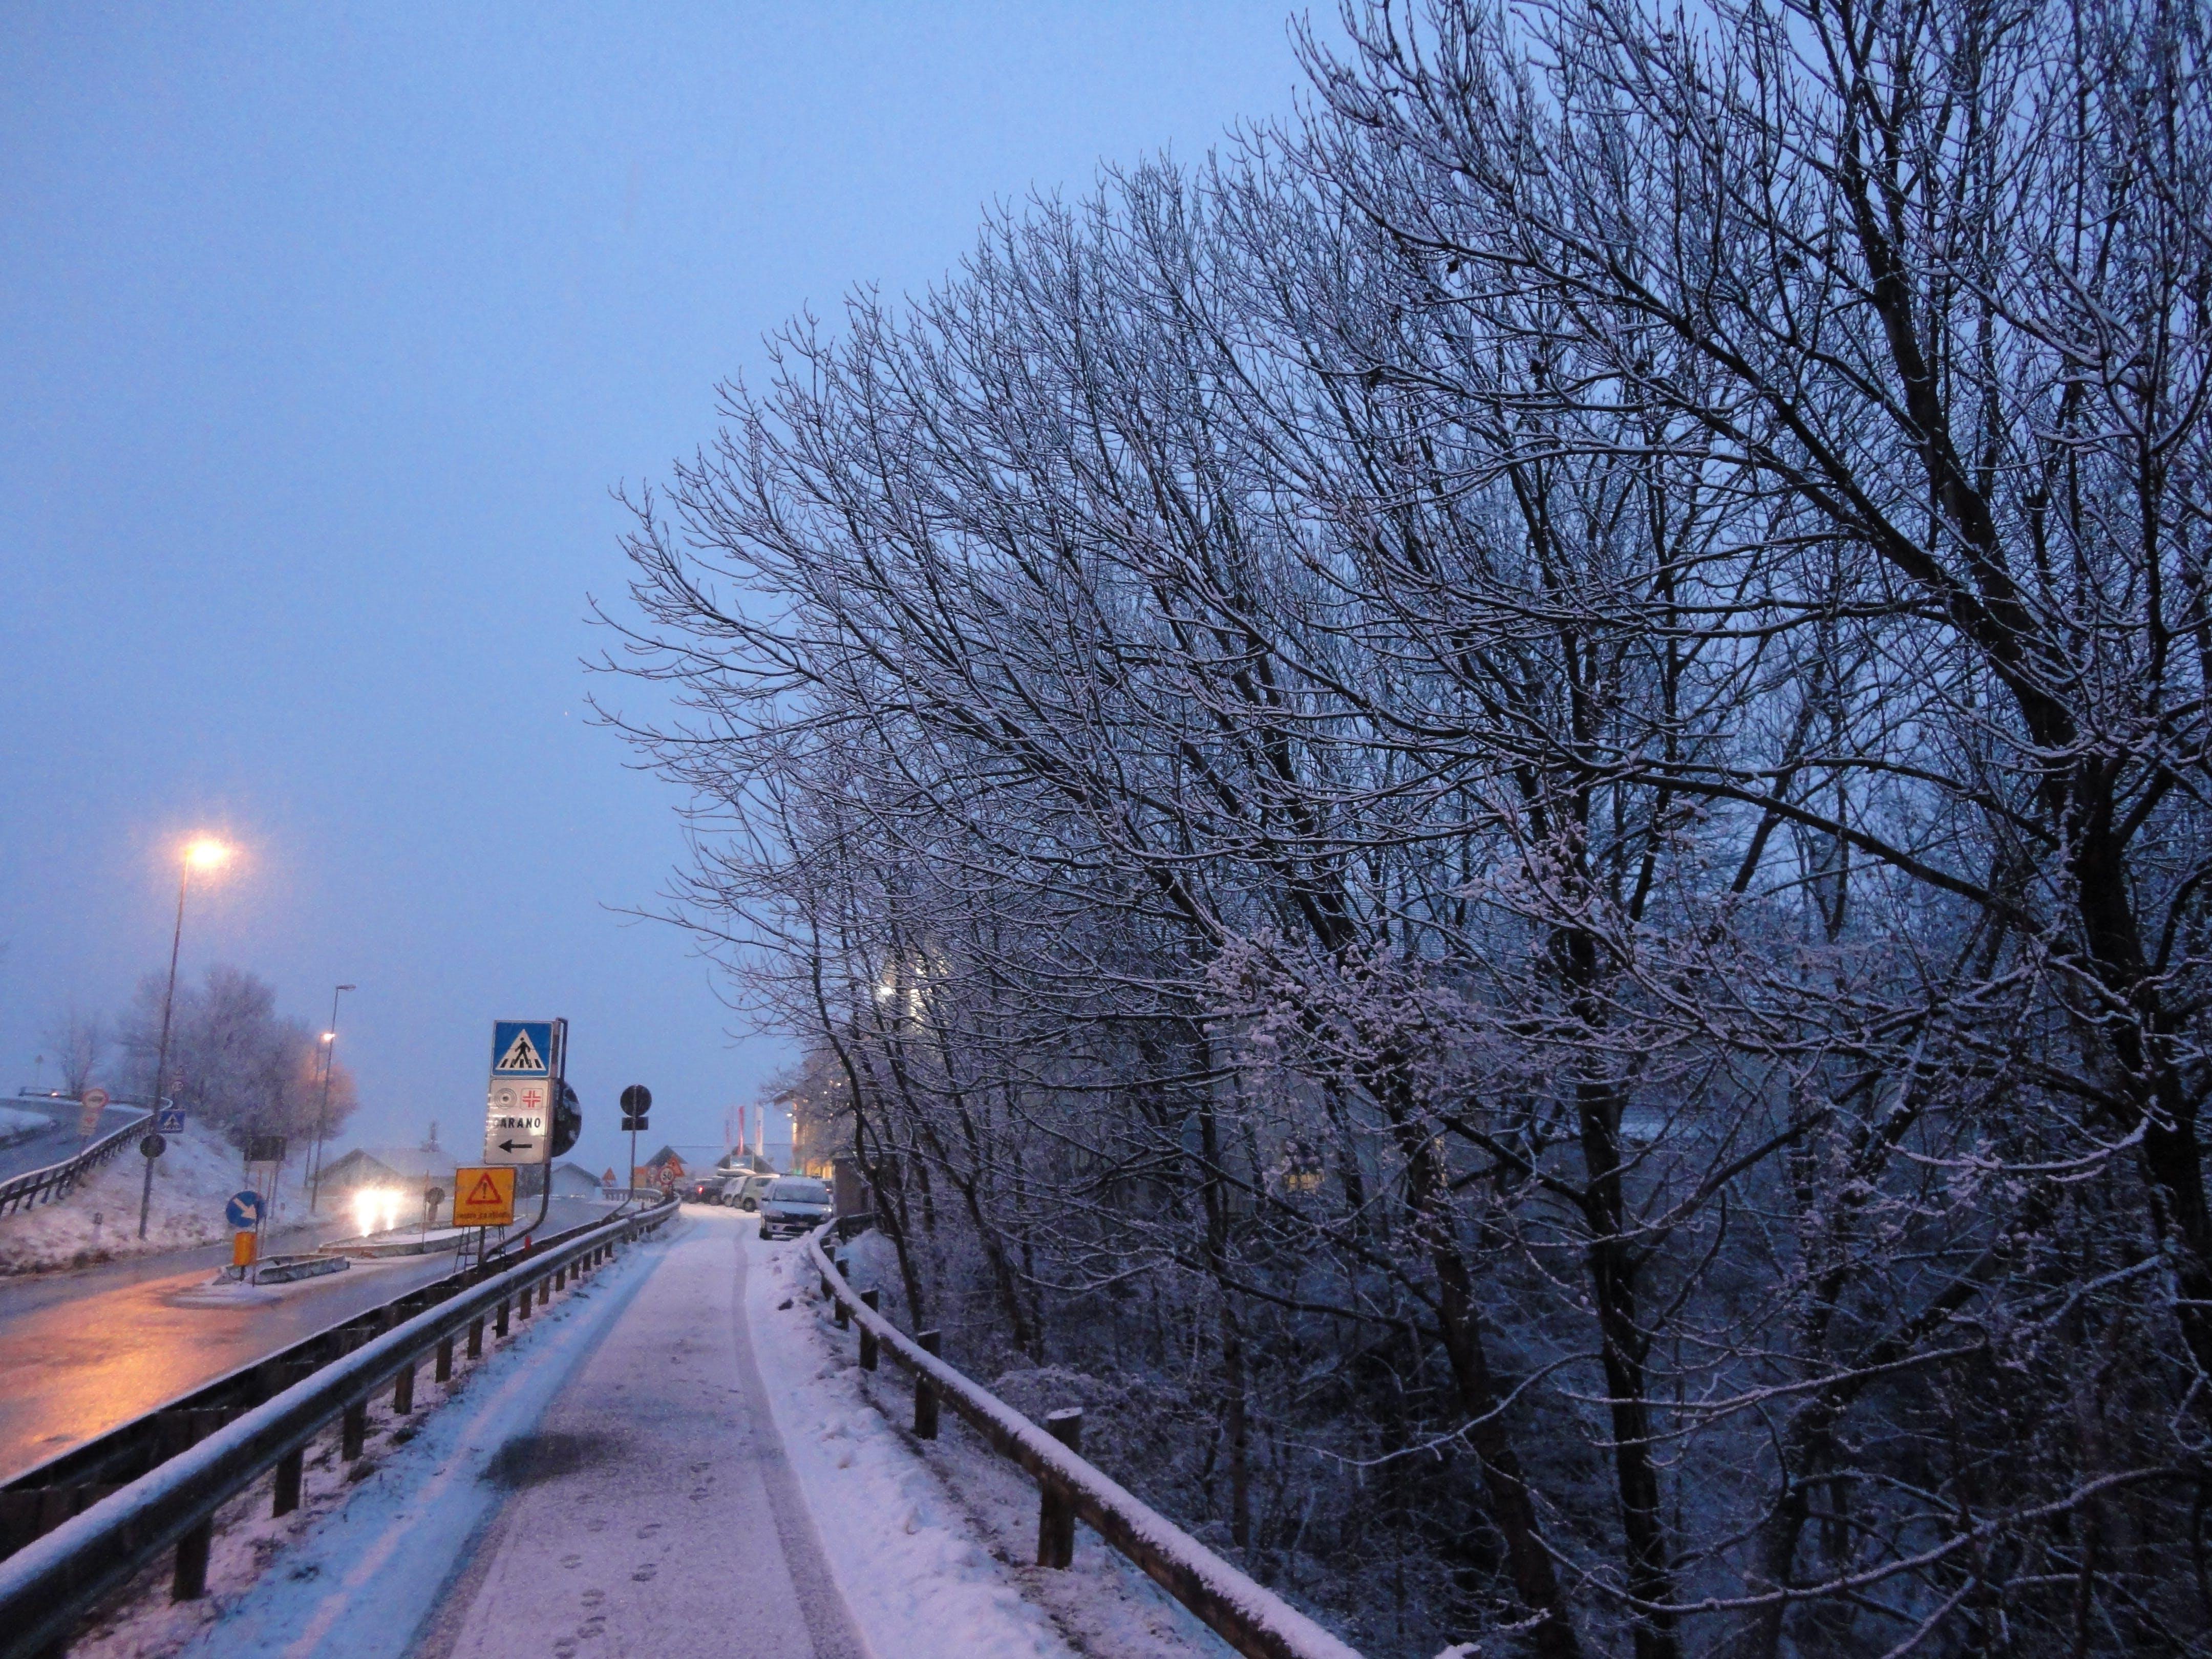 Free stock photo of Carano, Fiemme, inverno, light